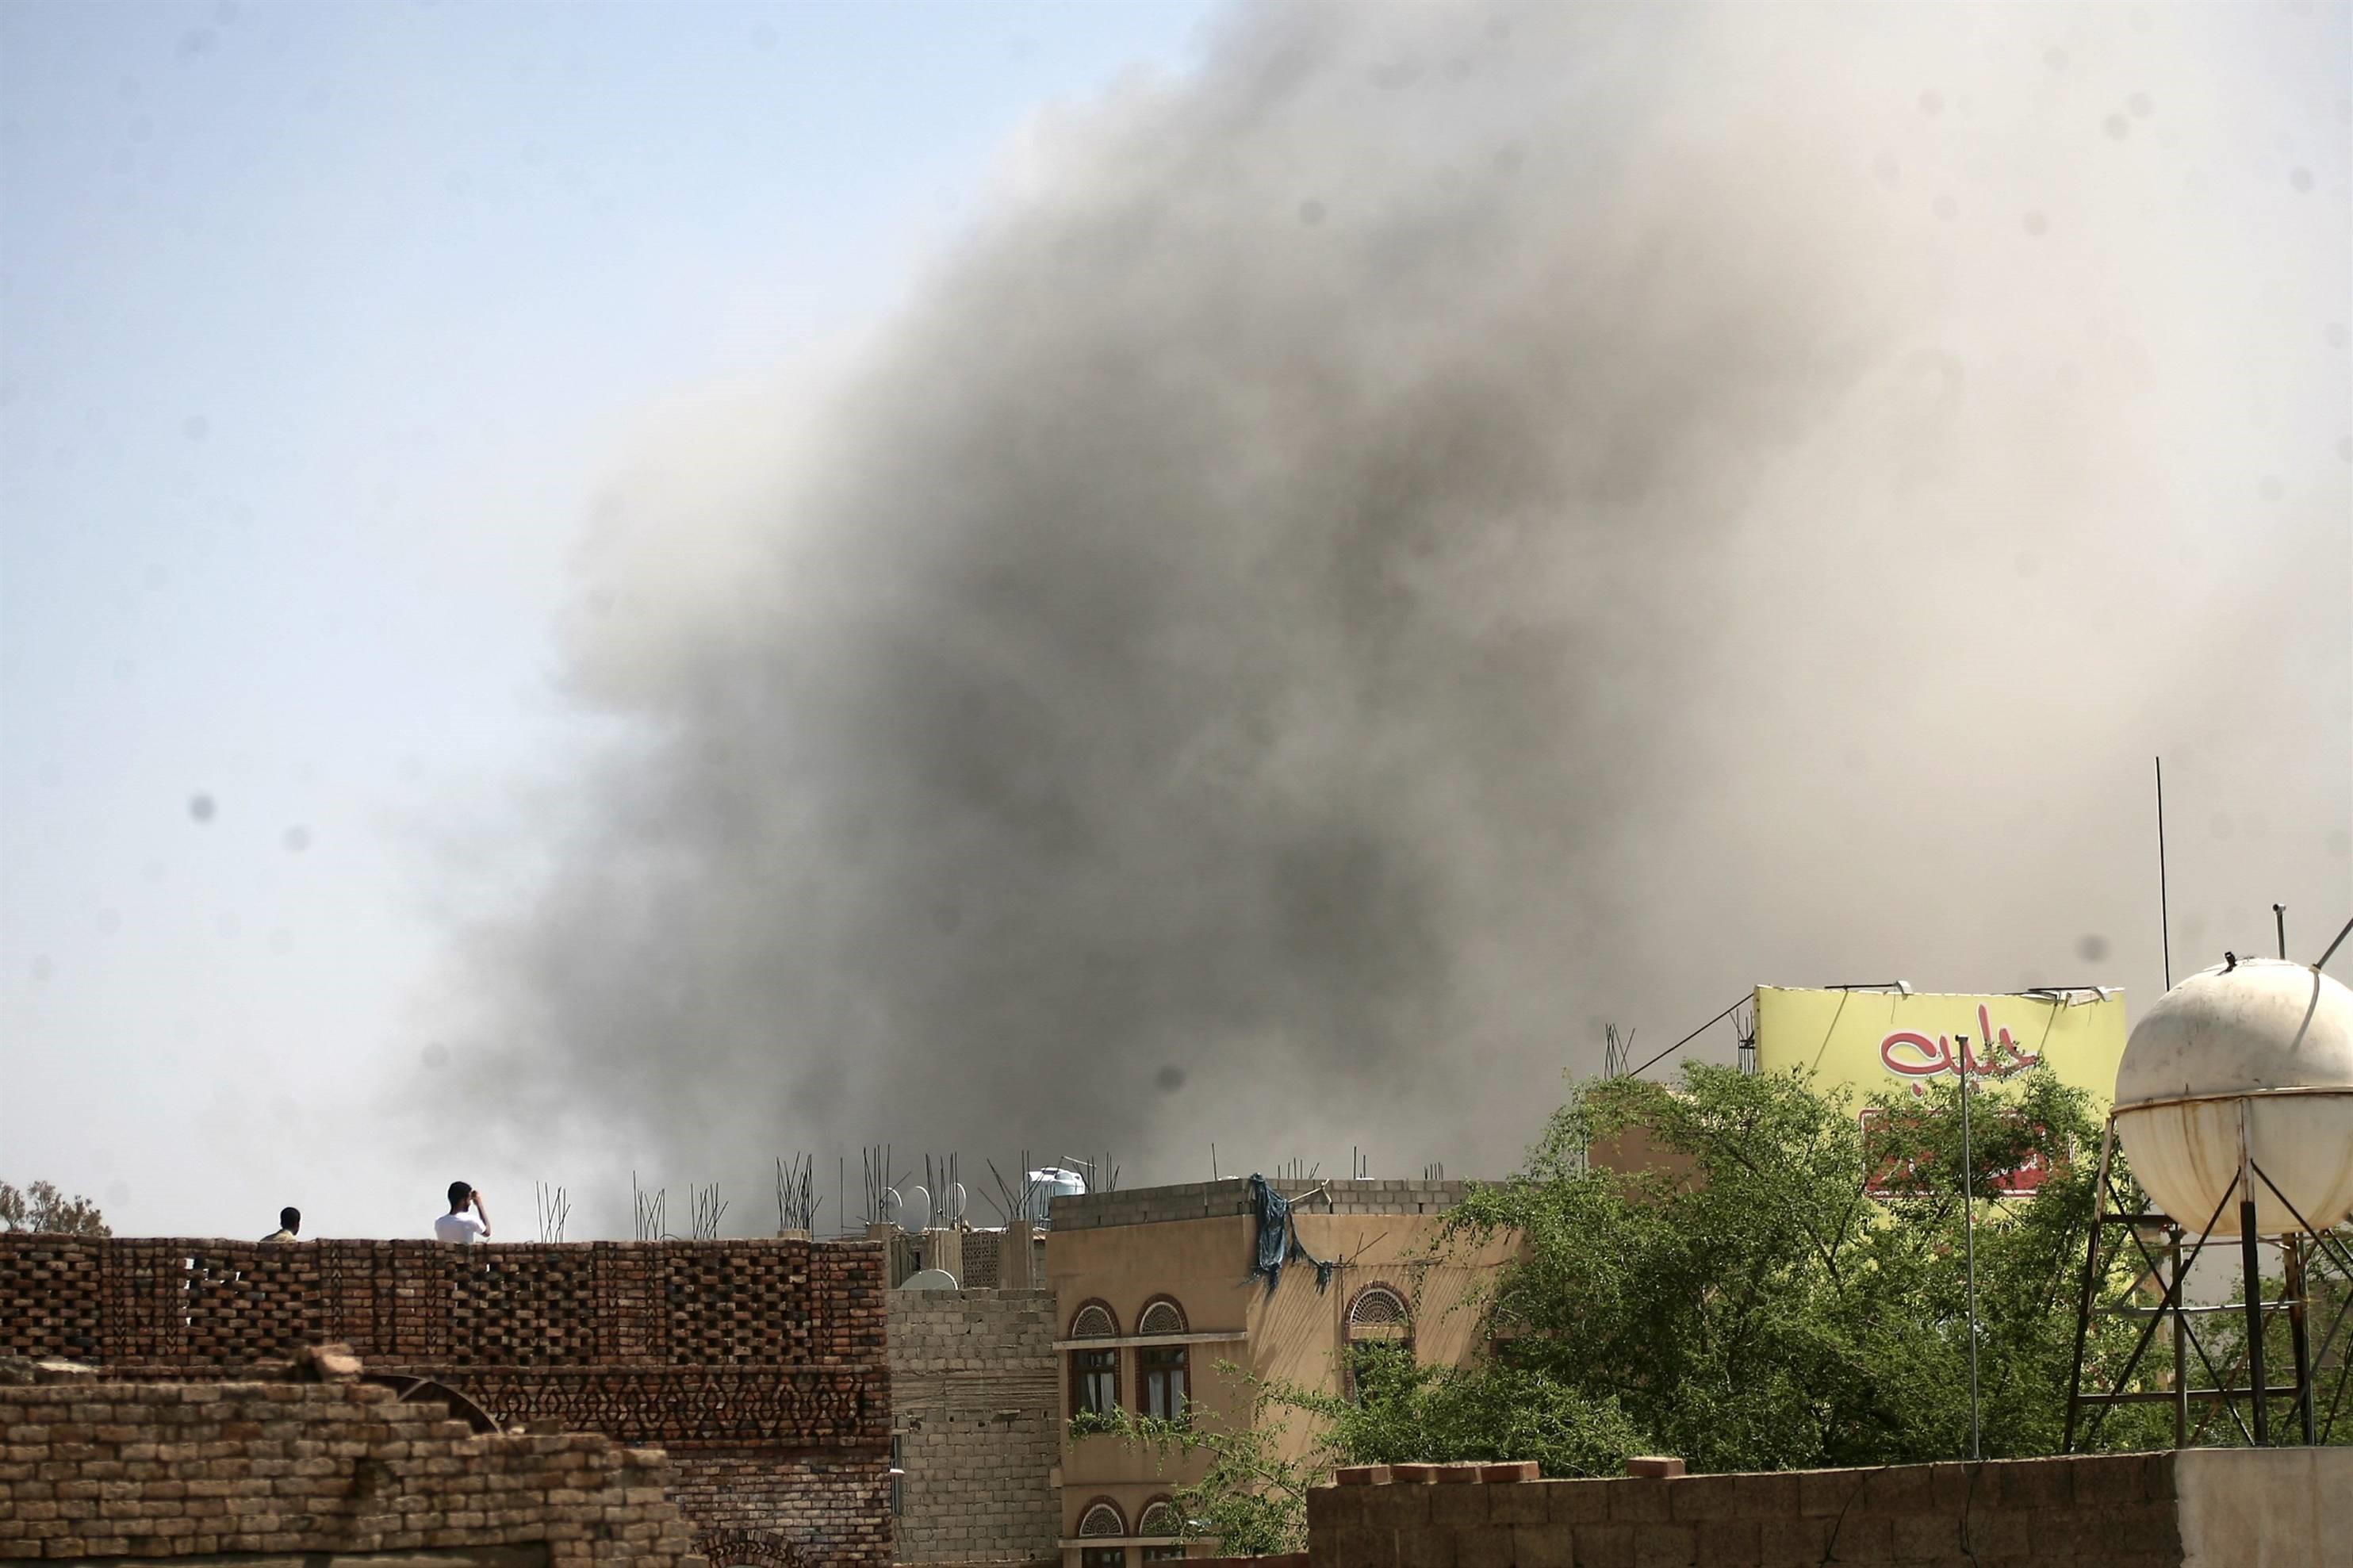 10 Civilian Killed in Saudi Airstrike in Yemeni Capital Sanaa